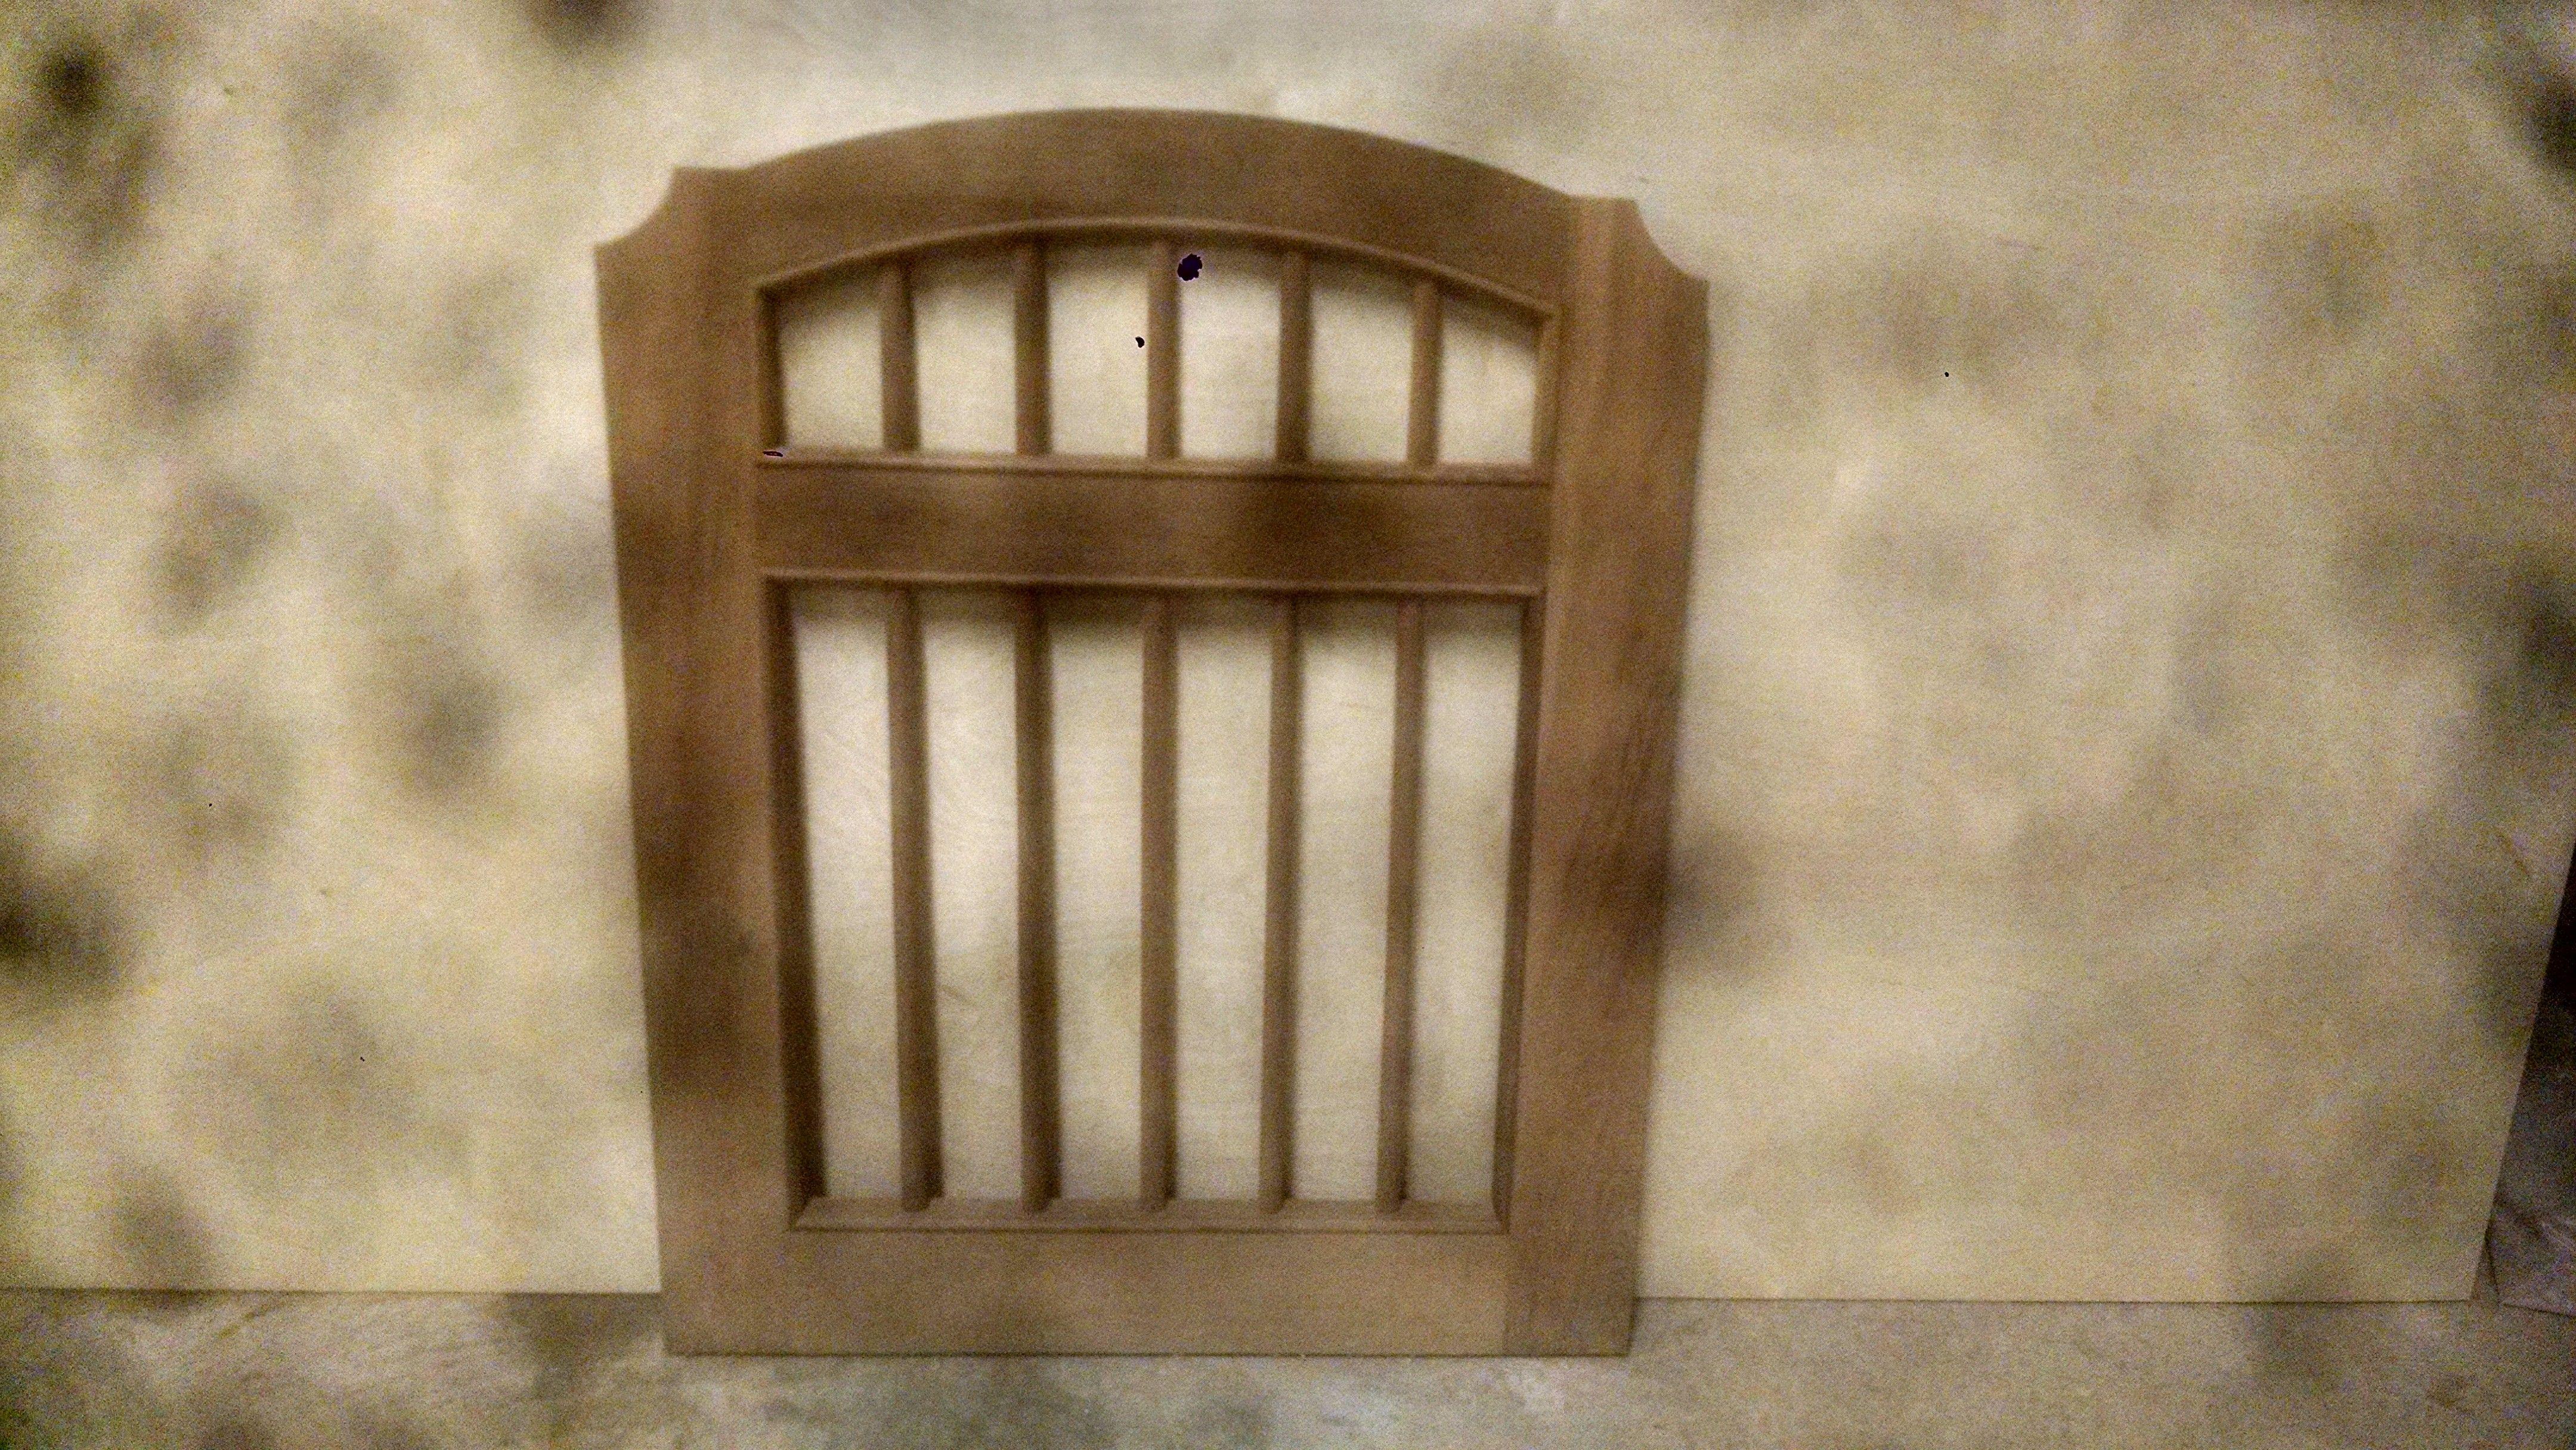 Buy a Custom Made Cedar Garden Gate..( Bastille), made to order from ...